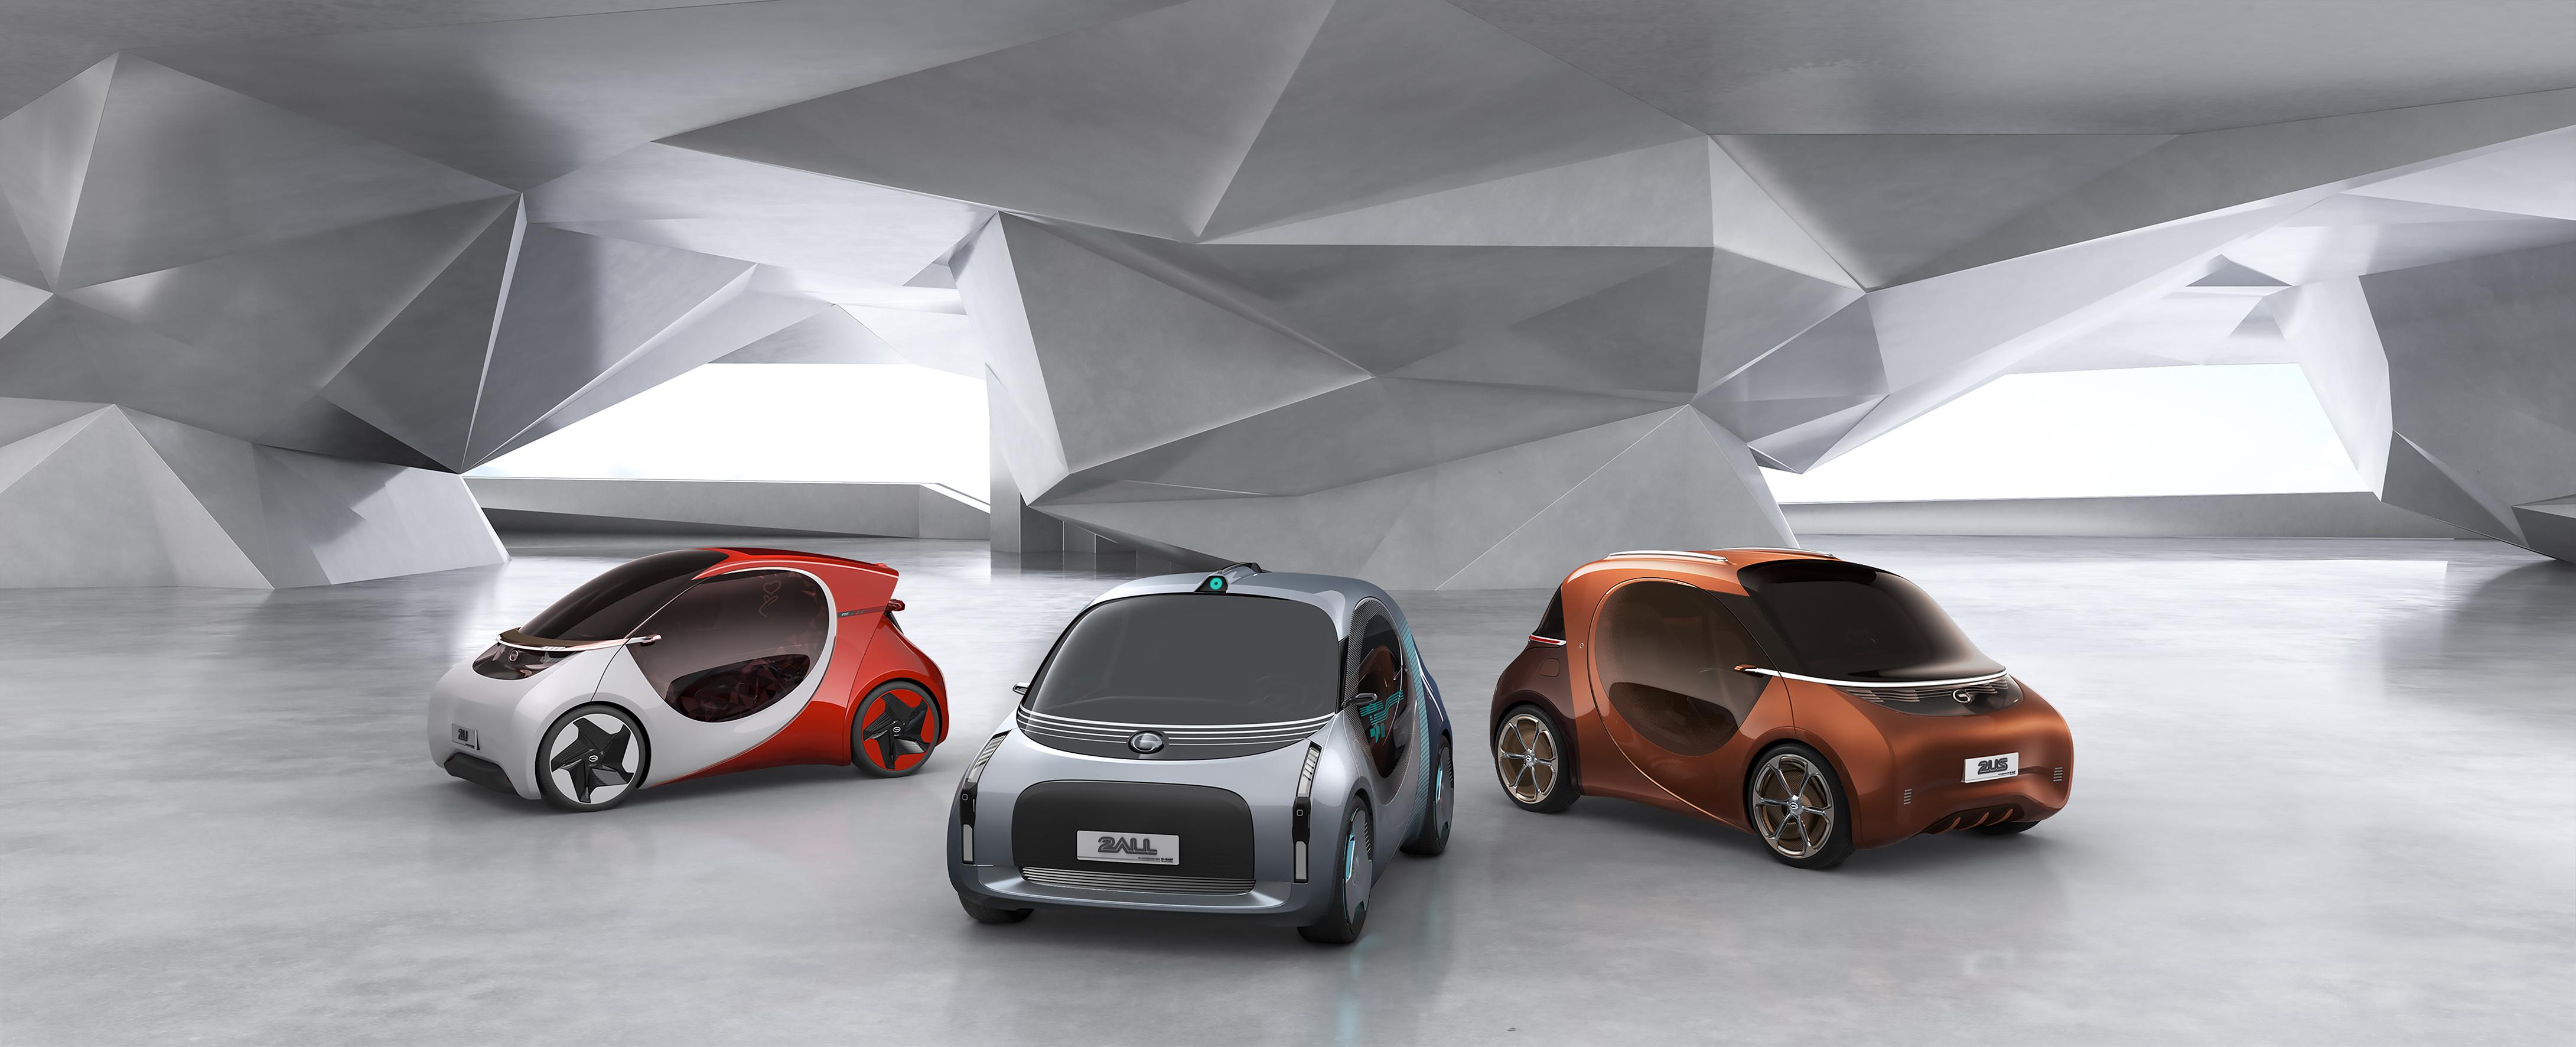 Electric Cars Electronics